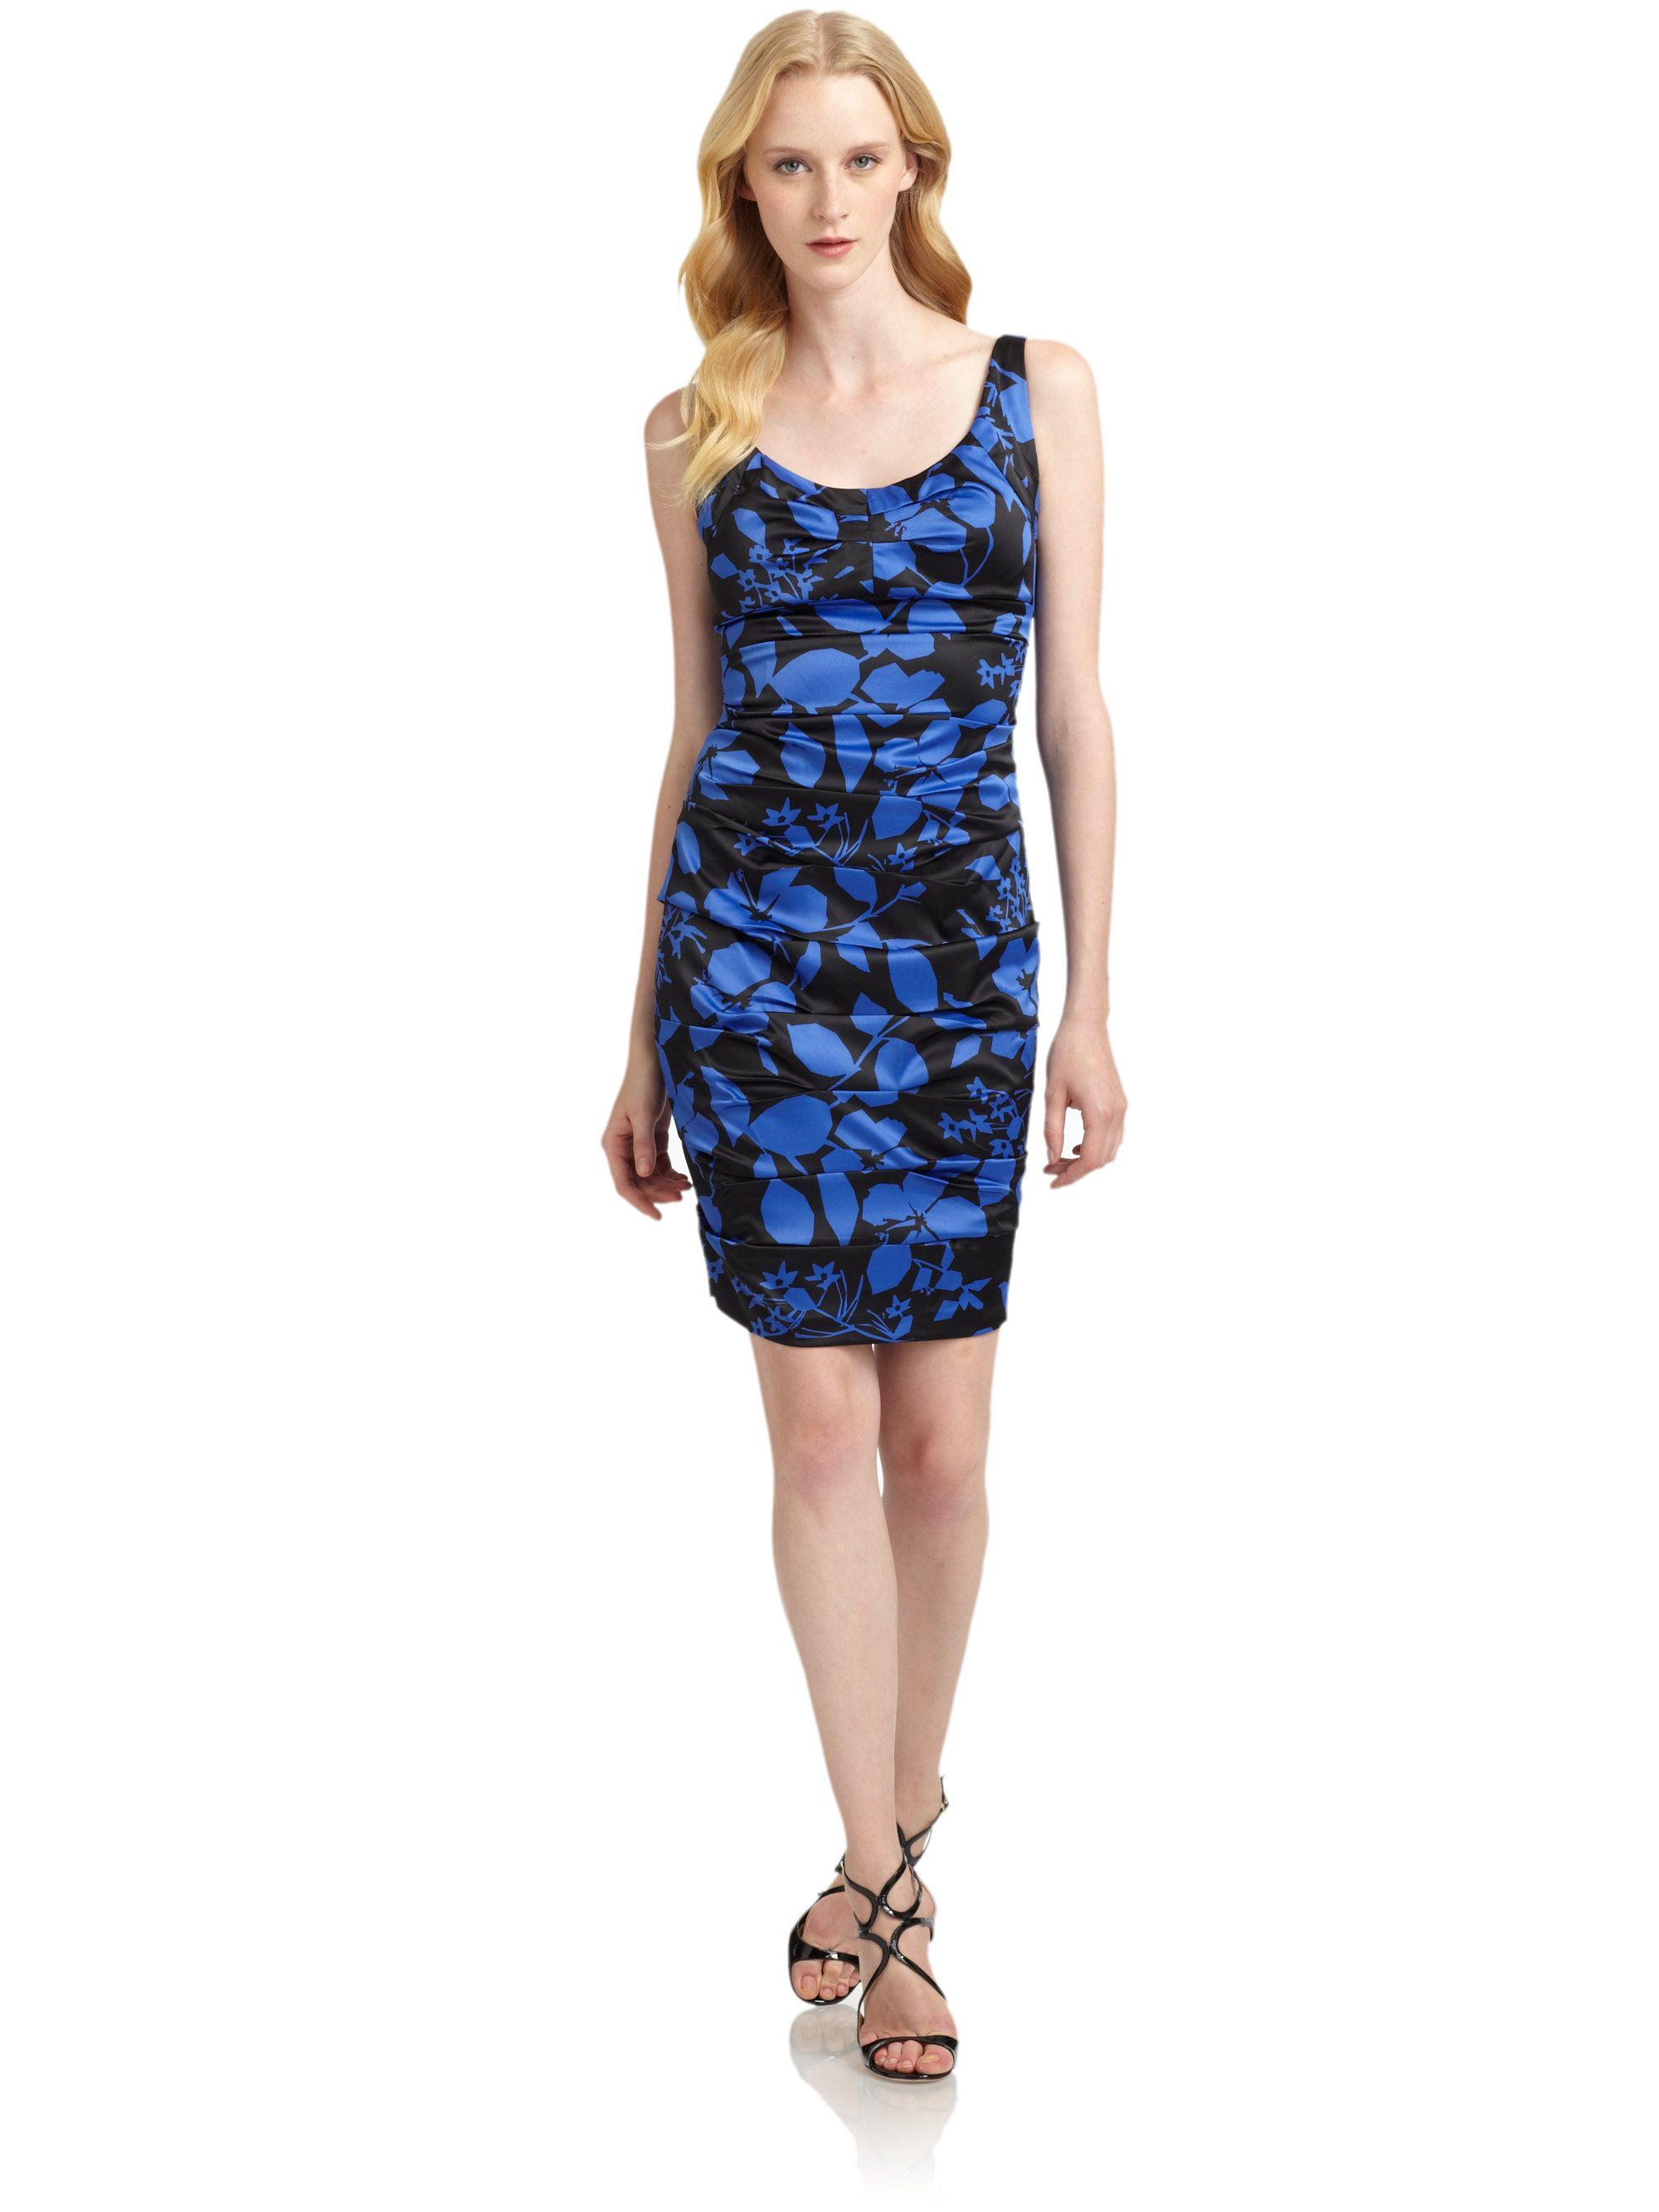 http://www.lyst.com/clothing/jax-satin-printed-cocktail-dress ...